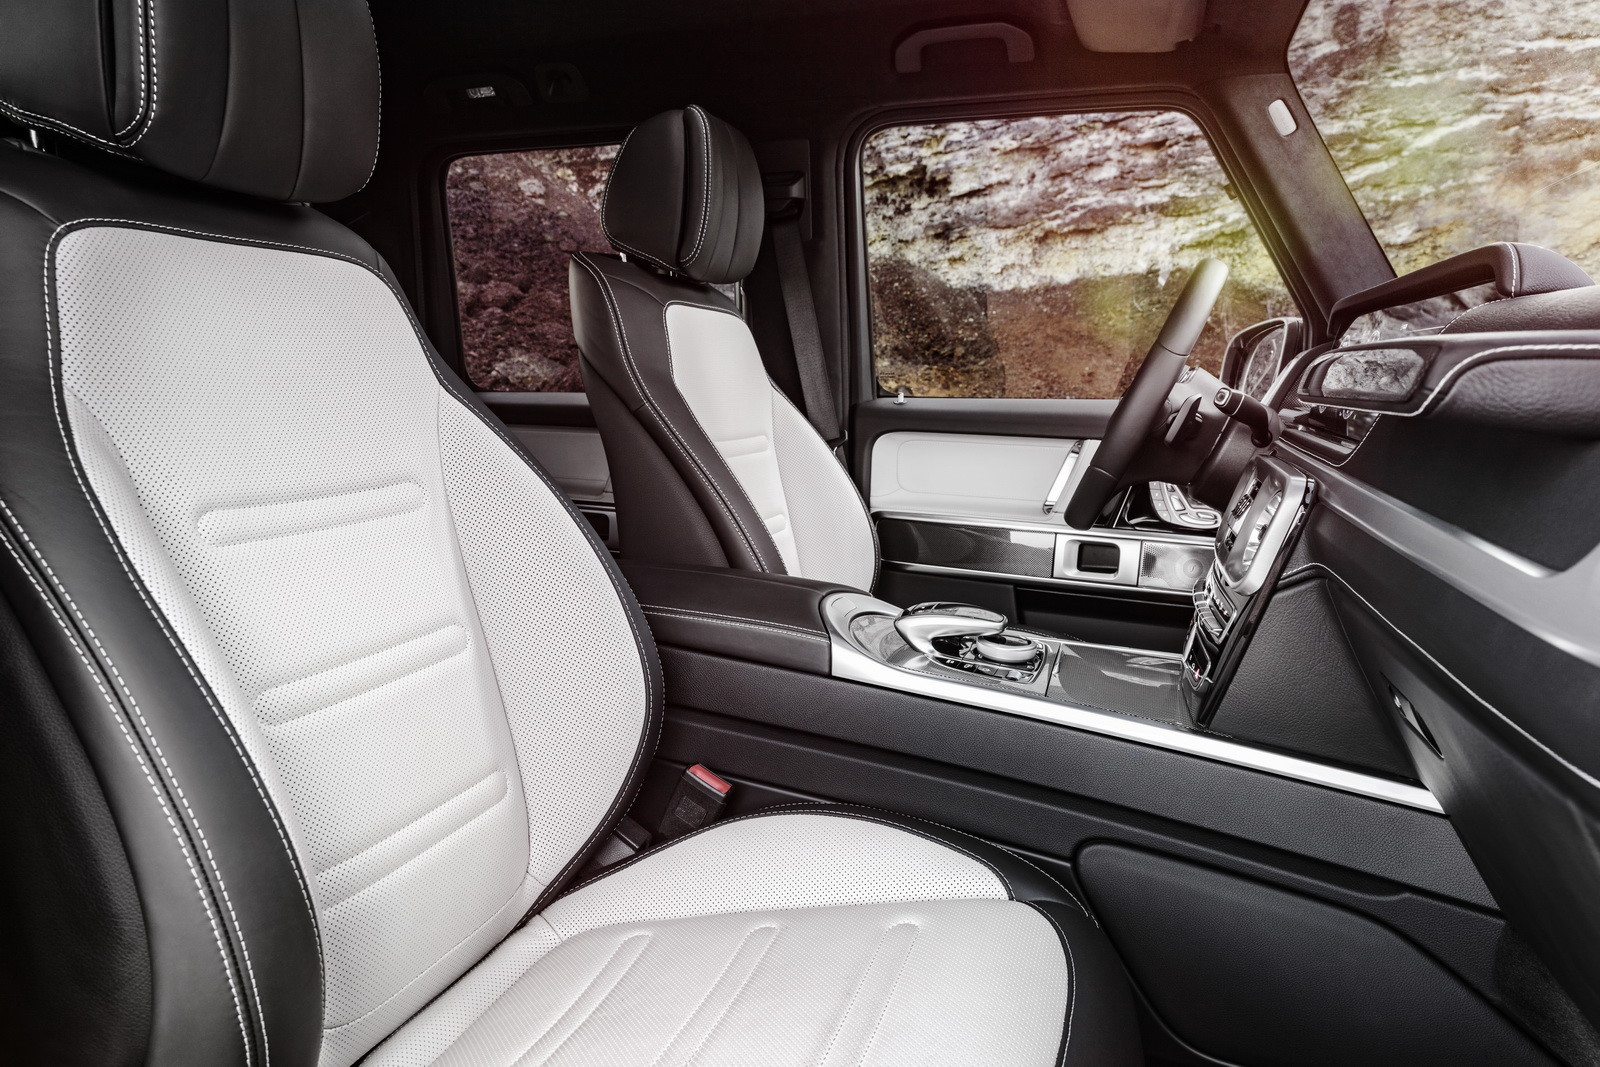 Foto de Mercedes-Benz Clase G 2018, imágenes filtradas (13/24)